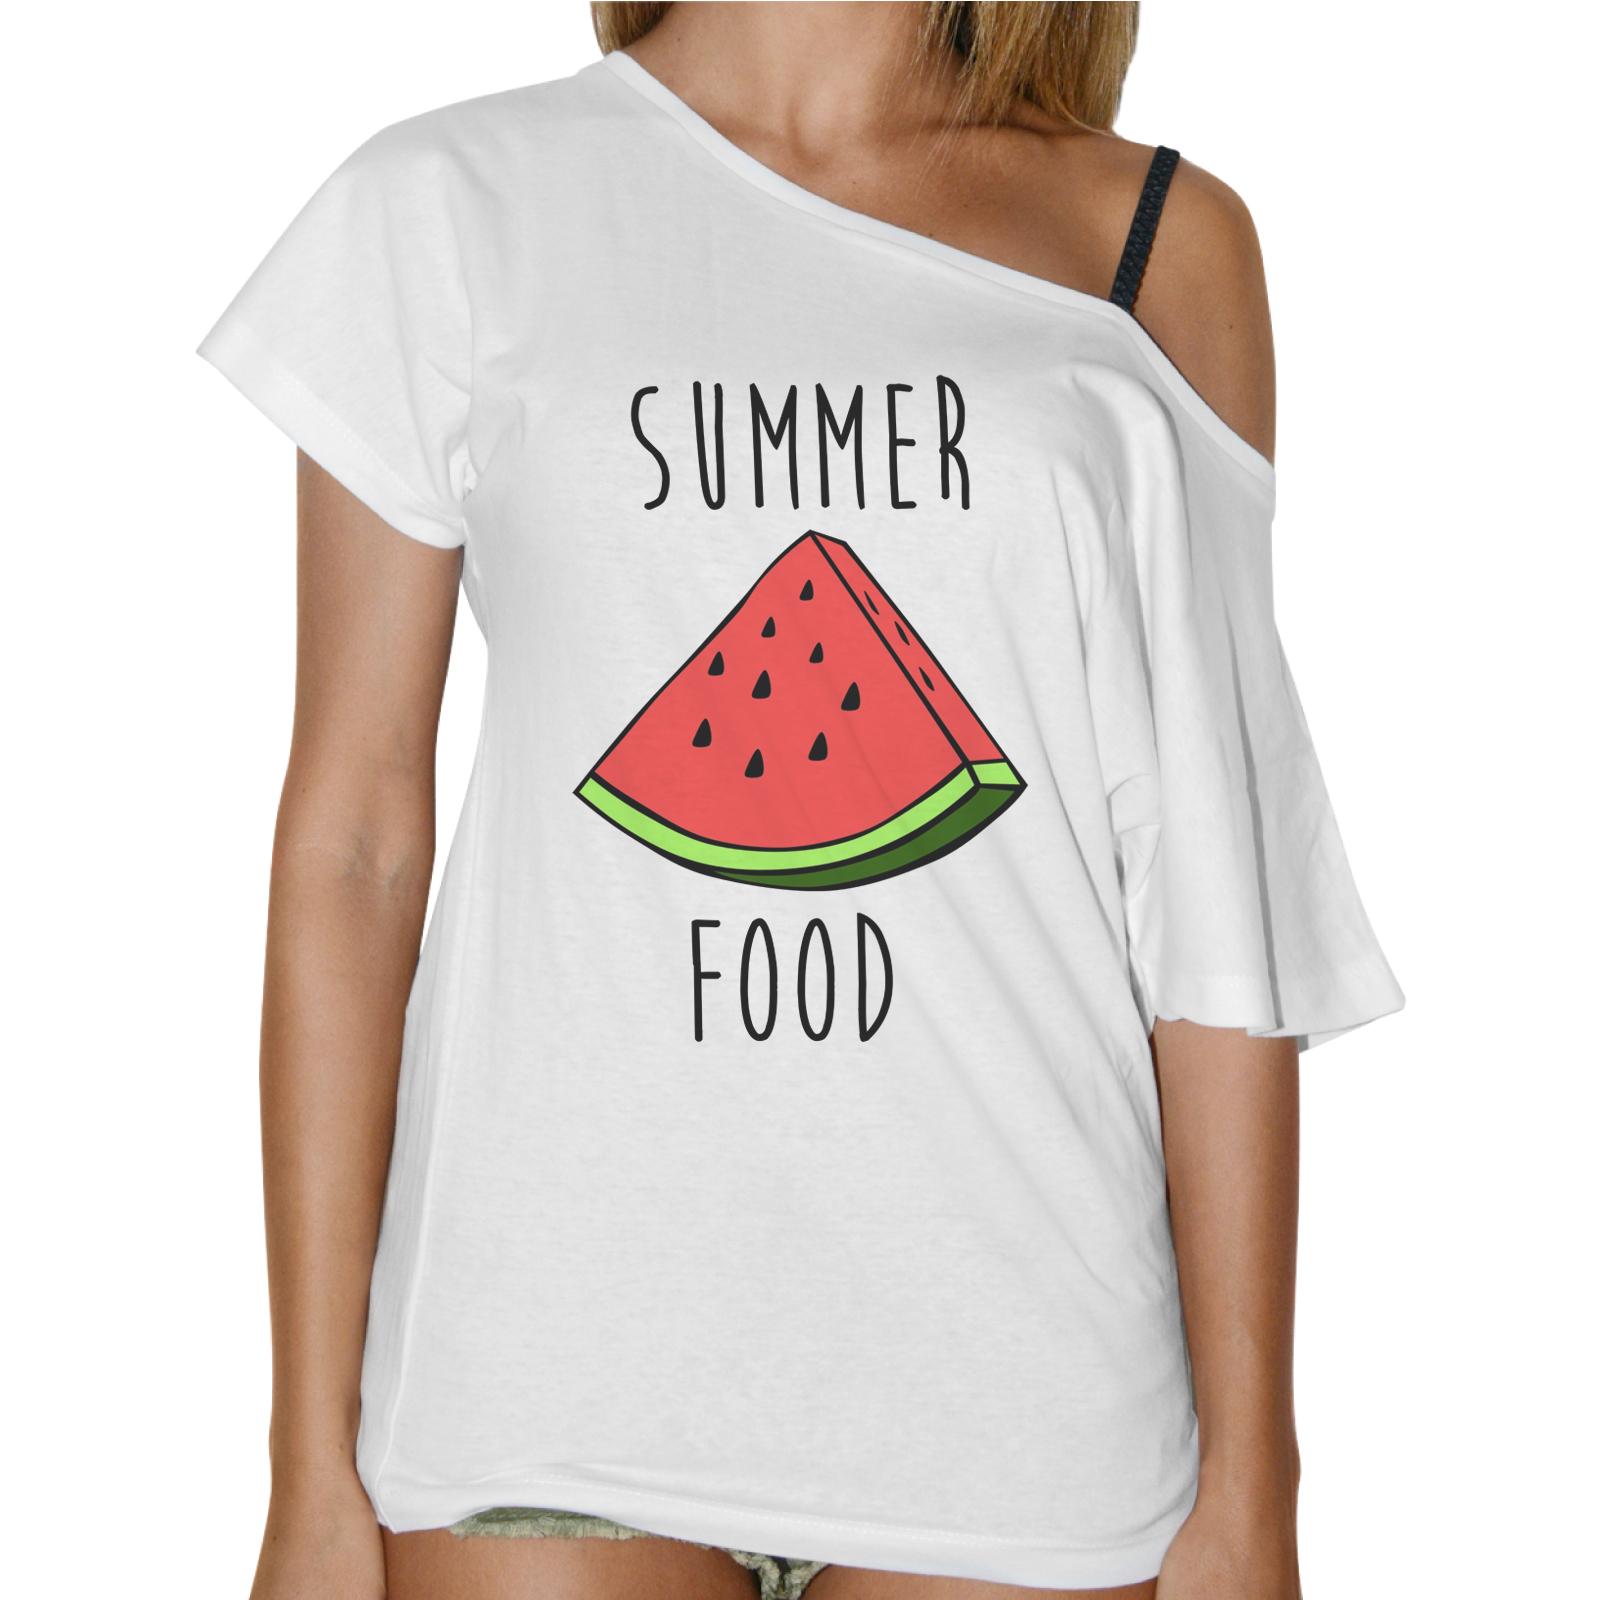 T-Shirt Donna Collo Barca SUMMER FOOD